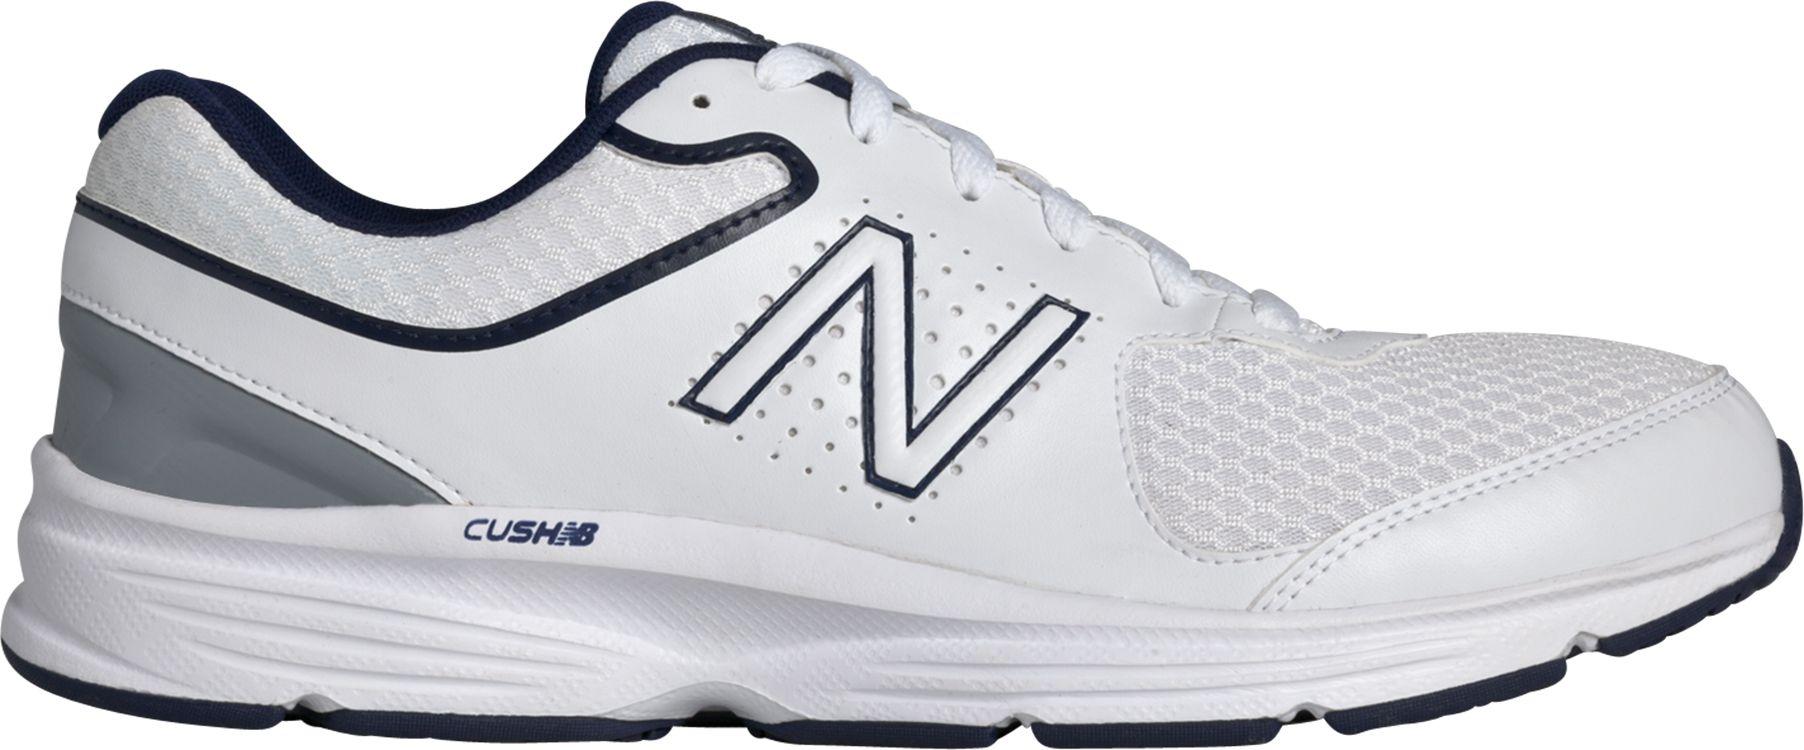 new balance walking shoes. new balance walking shoes